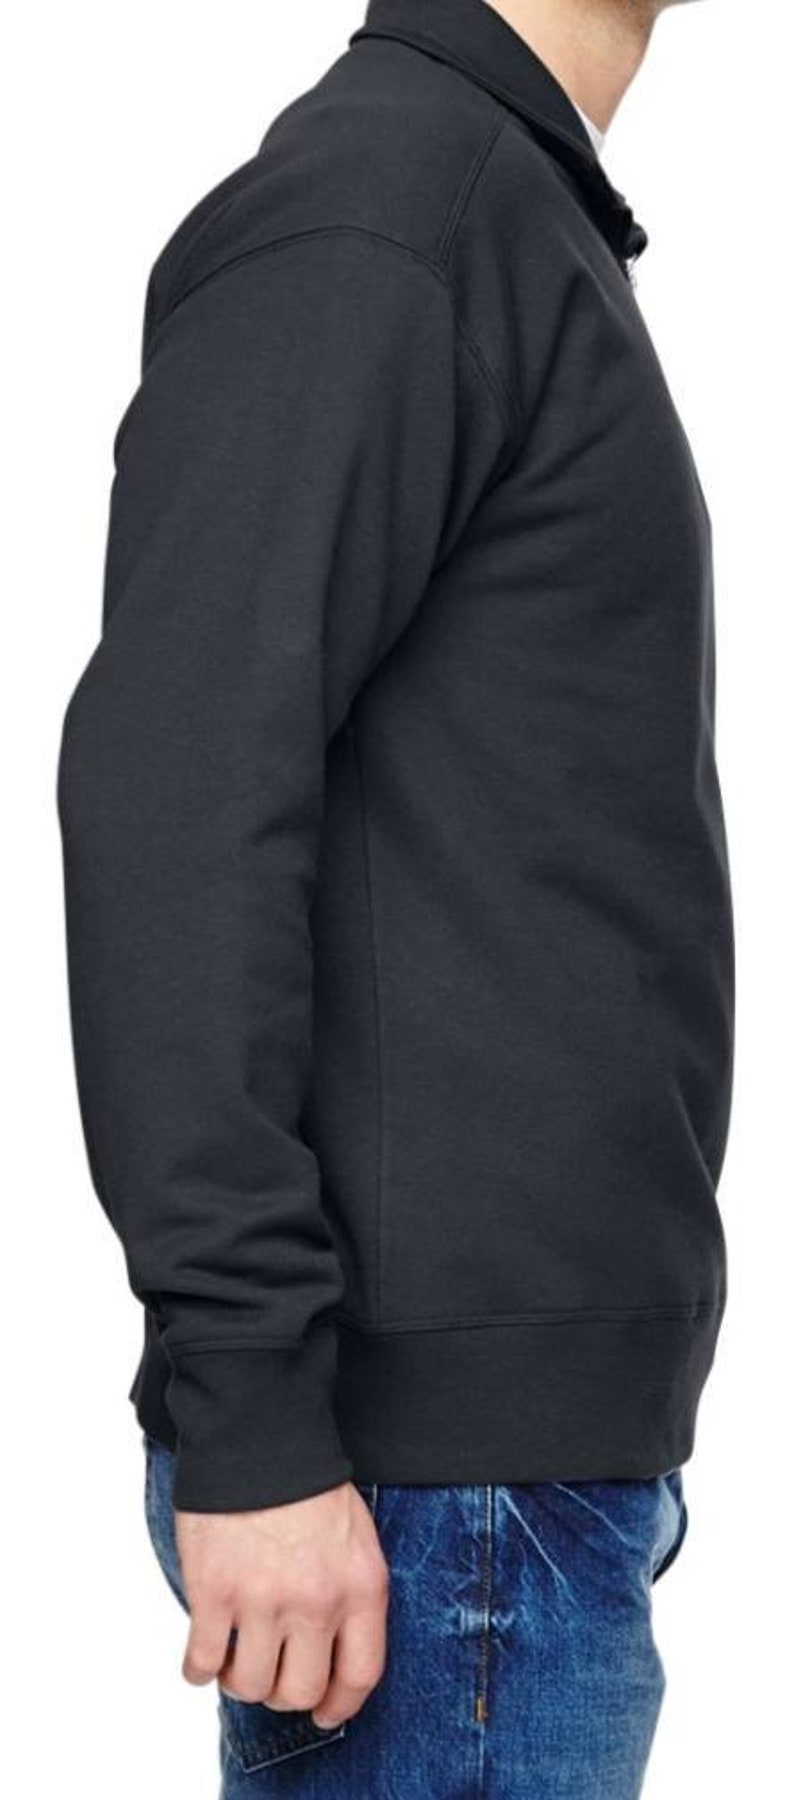 Mens thin blue line flag 34 zip up sweatshirt Police sweatshirt.